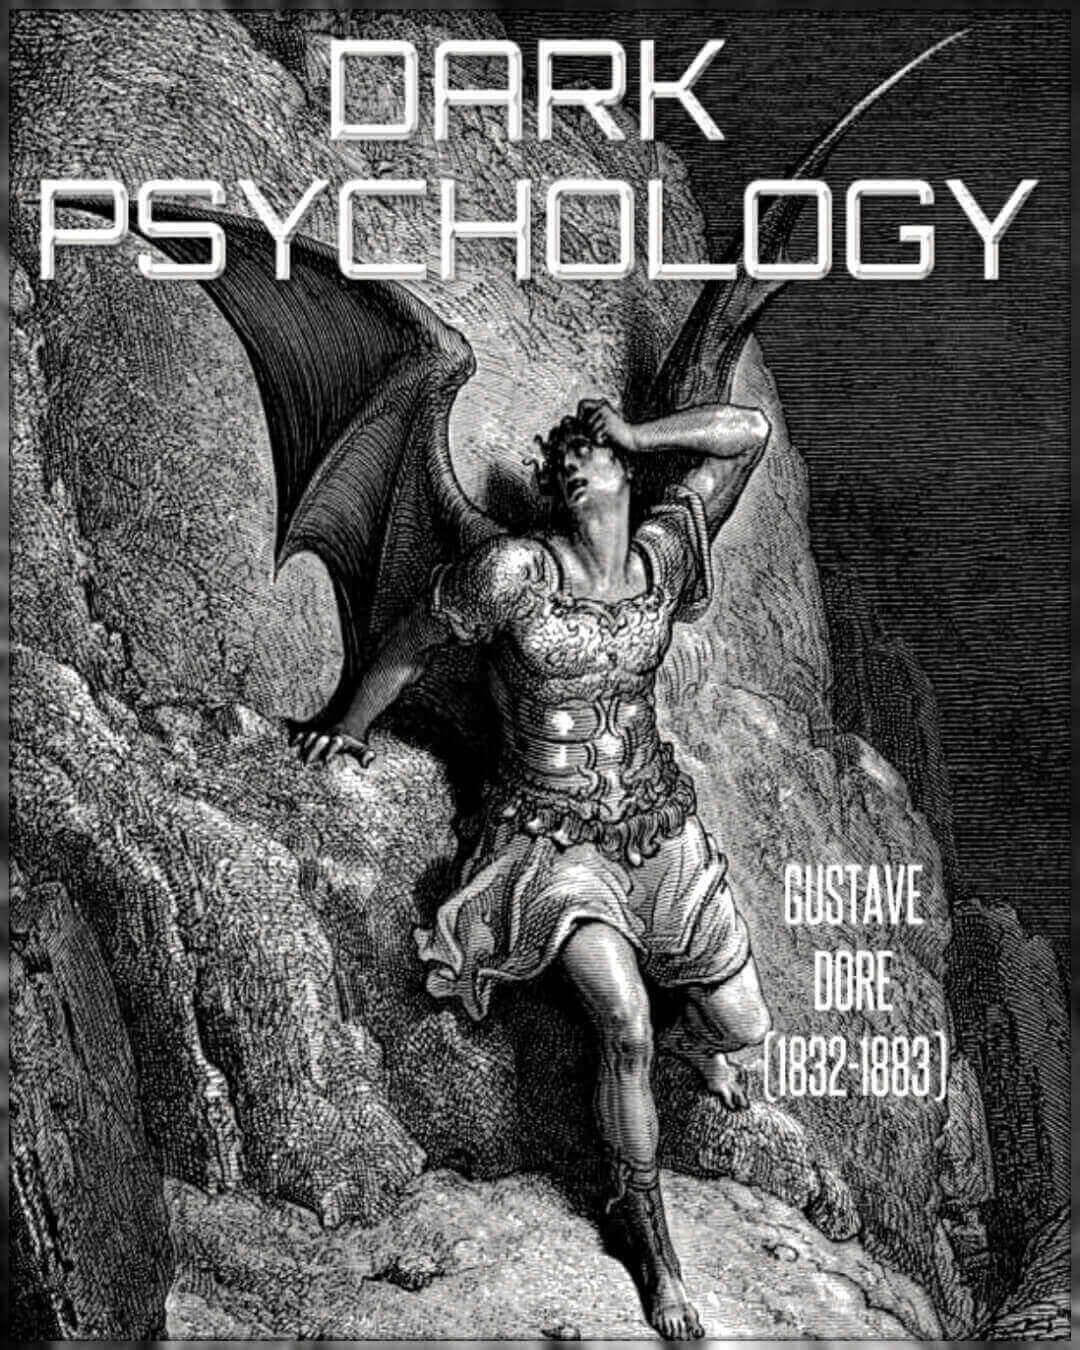 michael-nuccitelli-dark-psychology-image-8